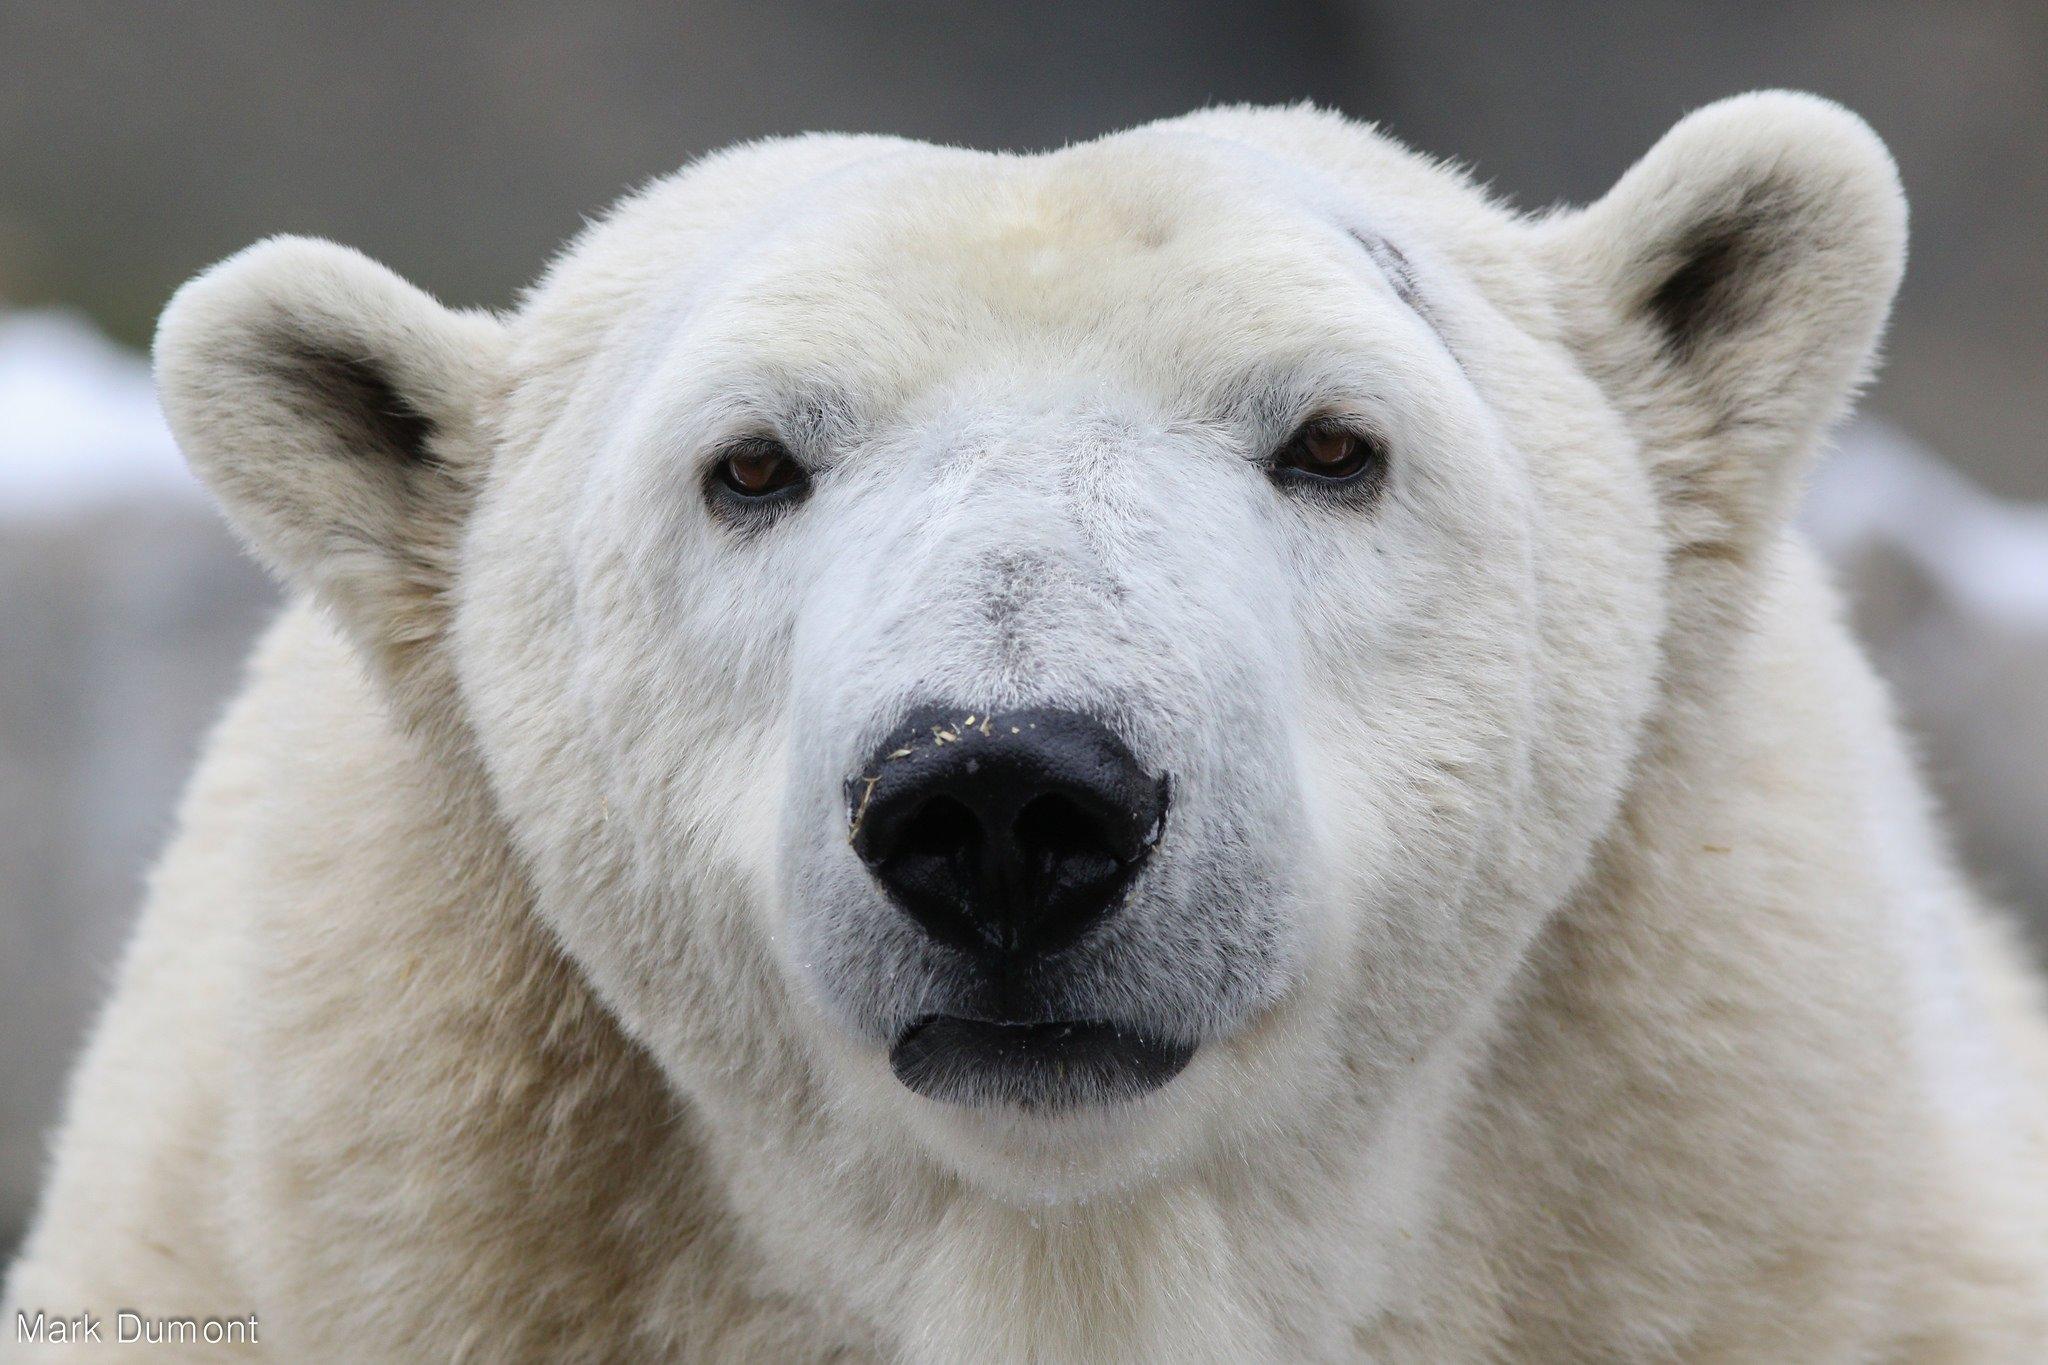 Berit the polar bear thanks you! (Photo: Mark Dumont)